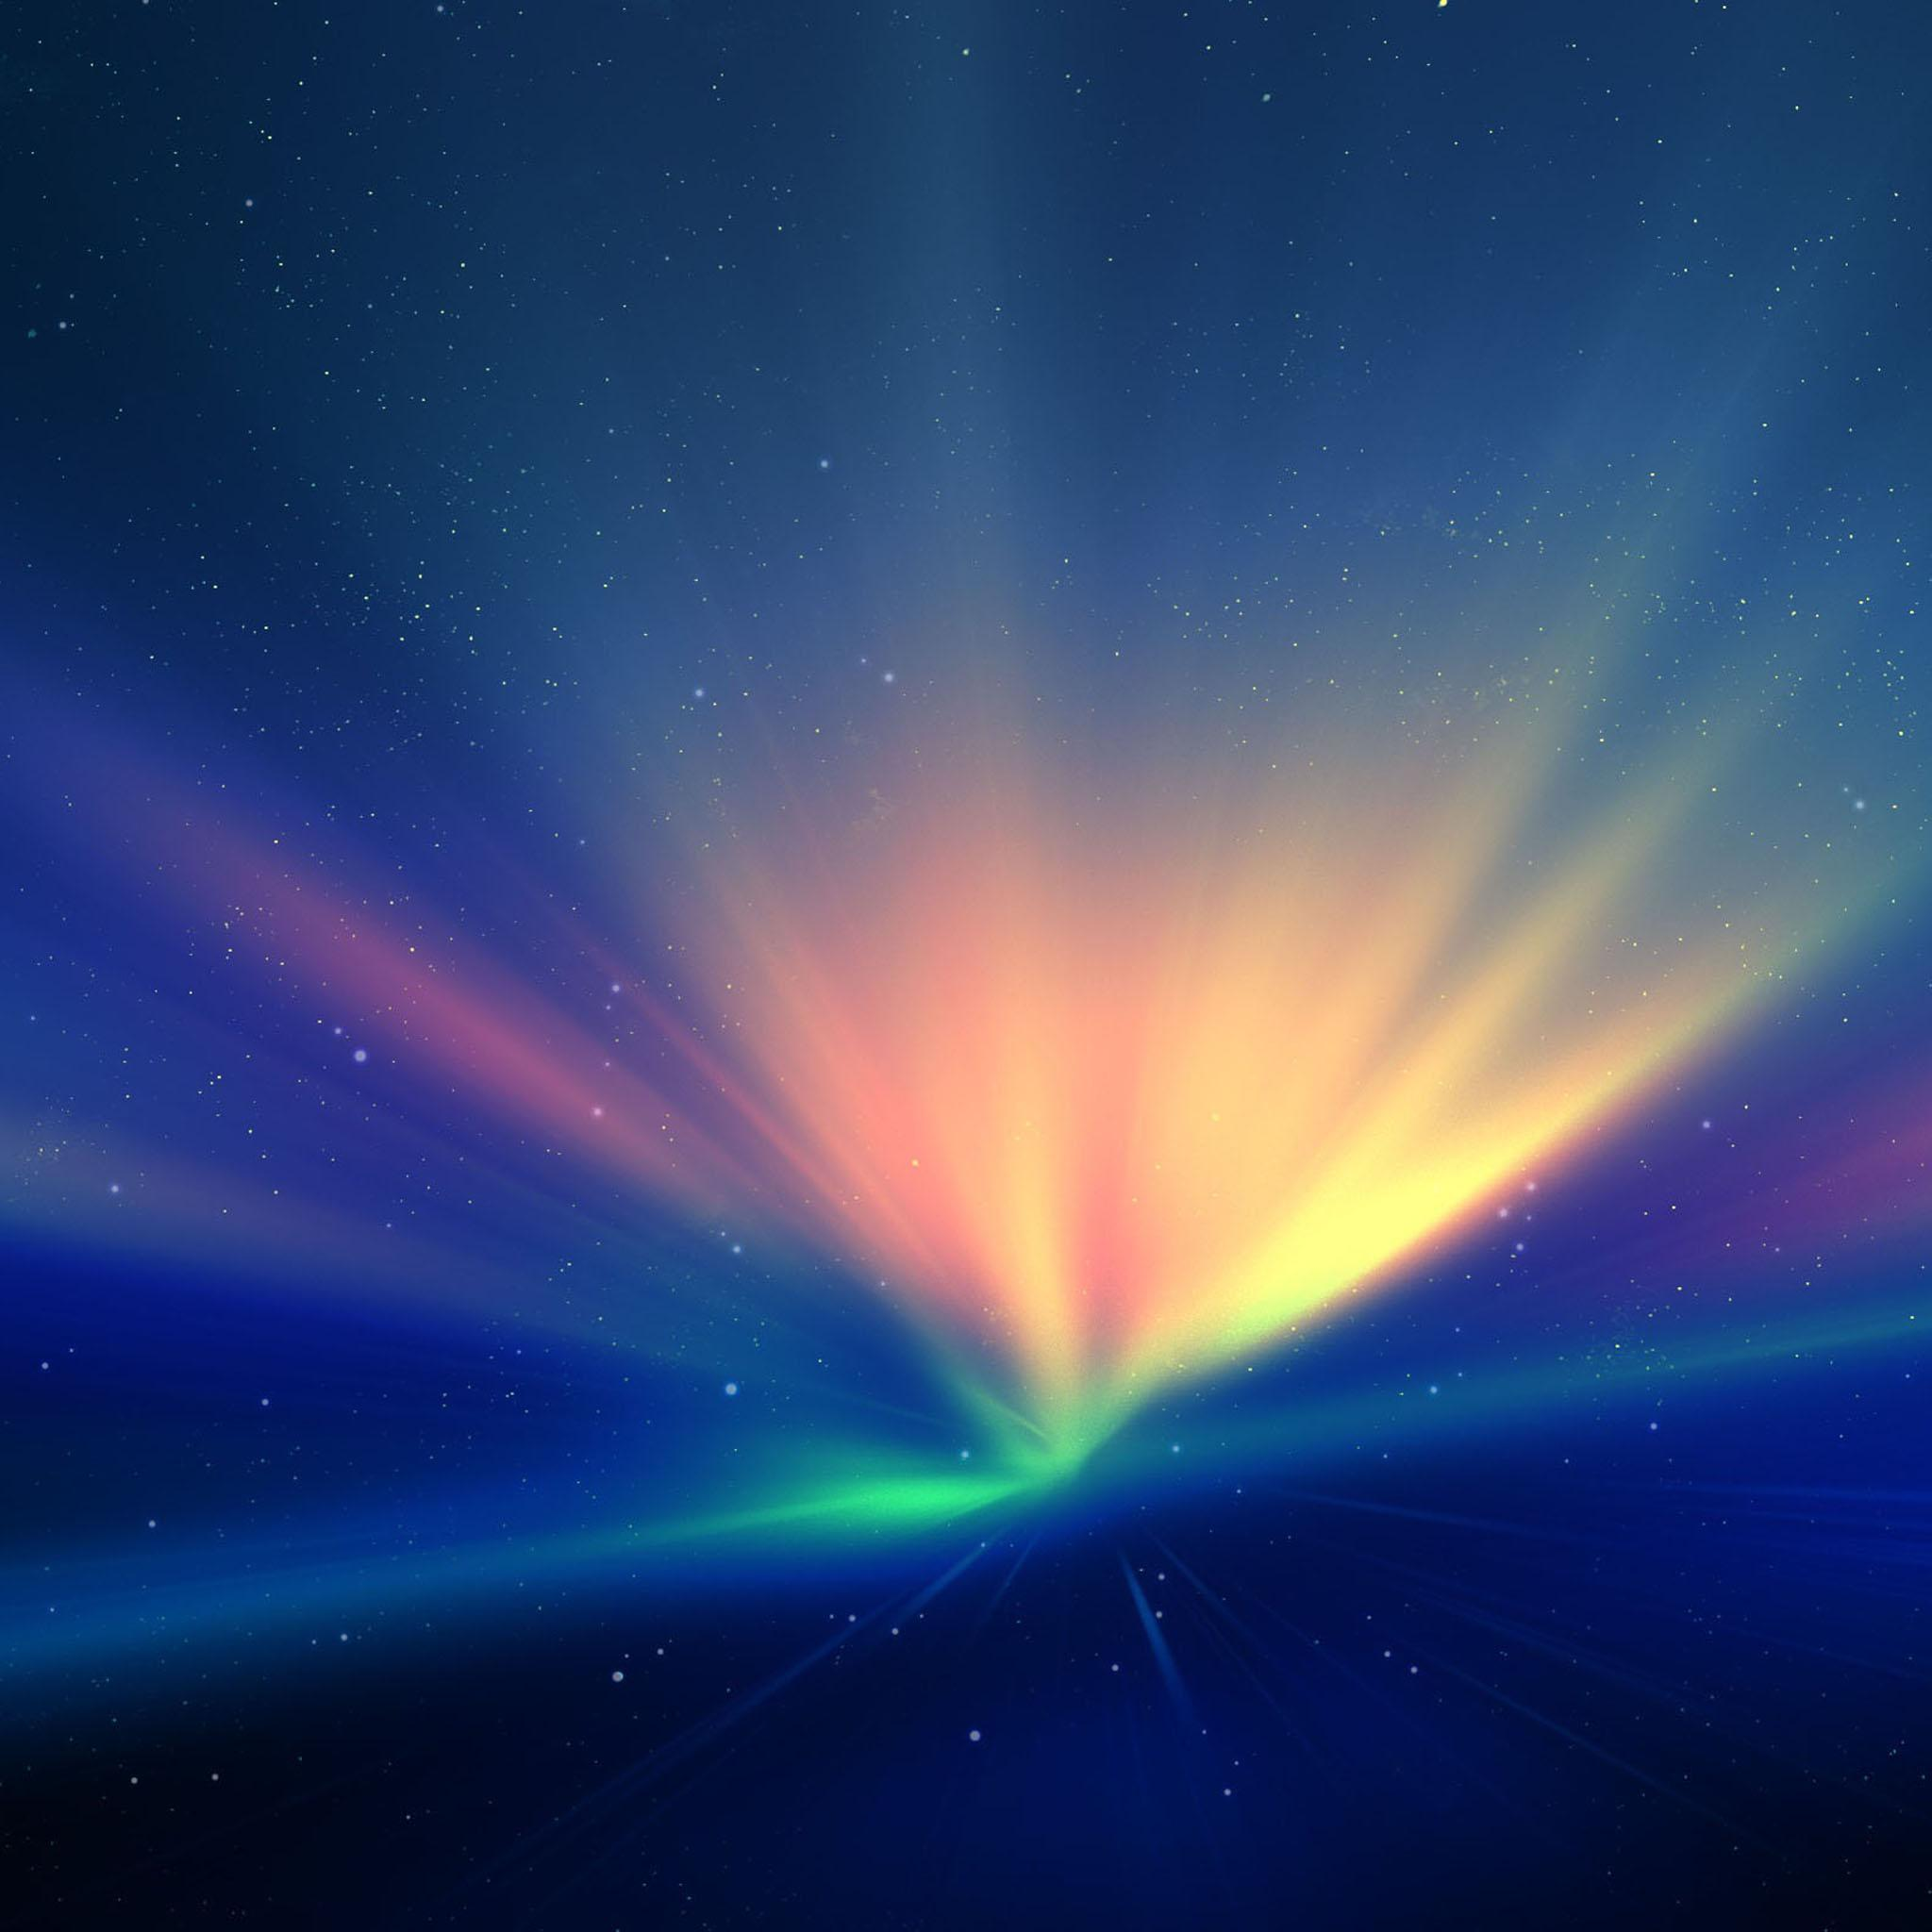 Aurora-Reloaded-Vintage-3Wallpapers iPad Retina